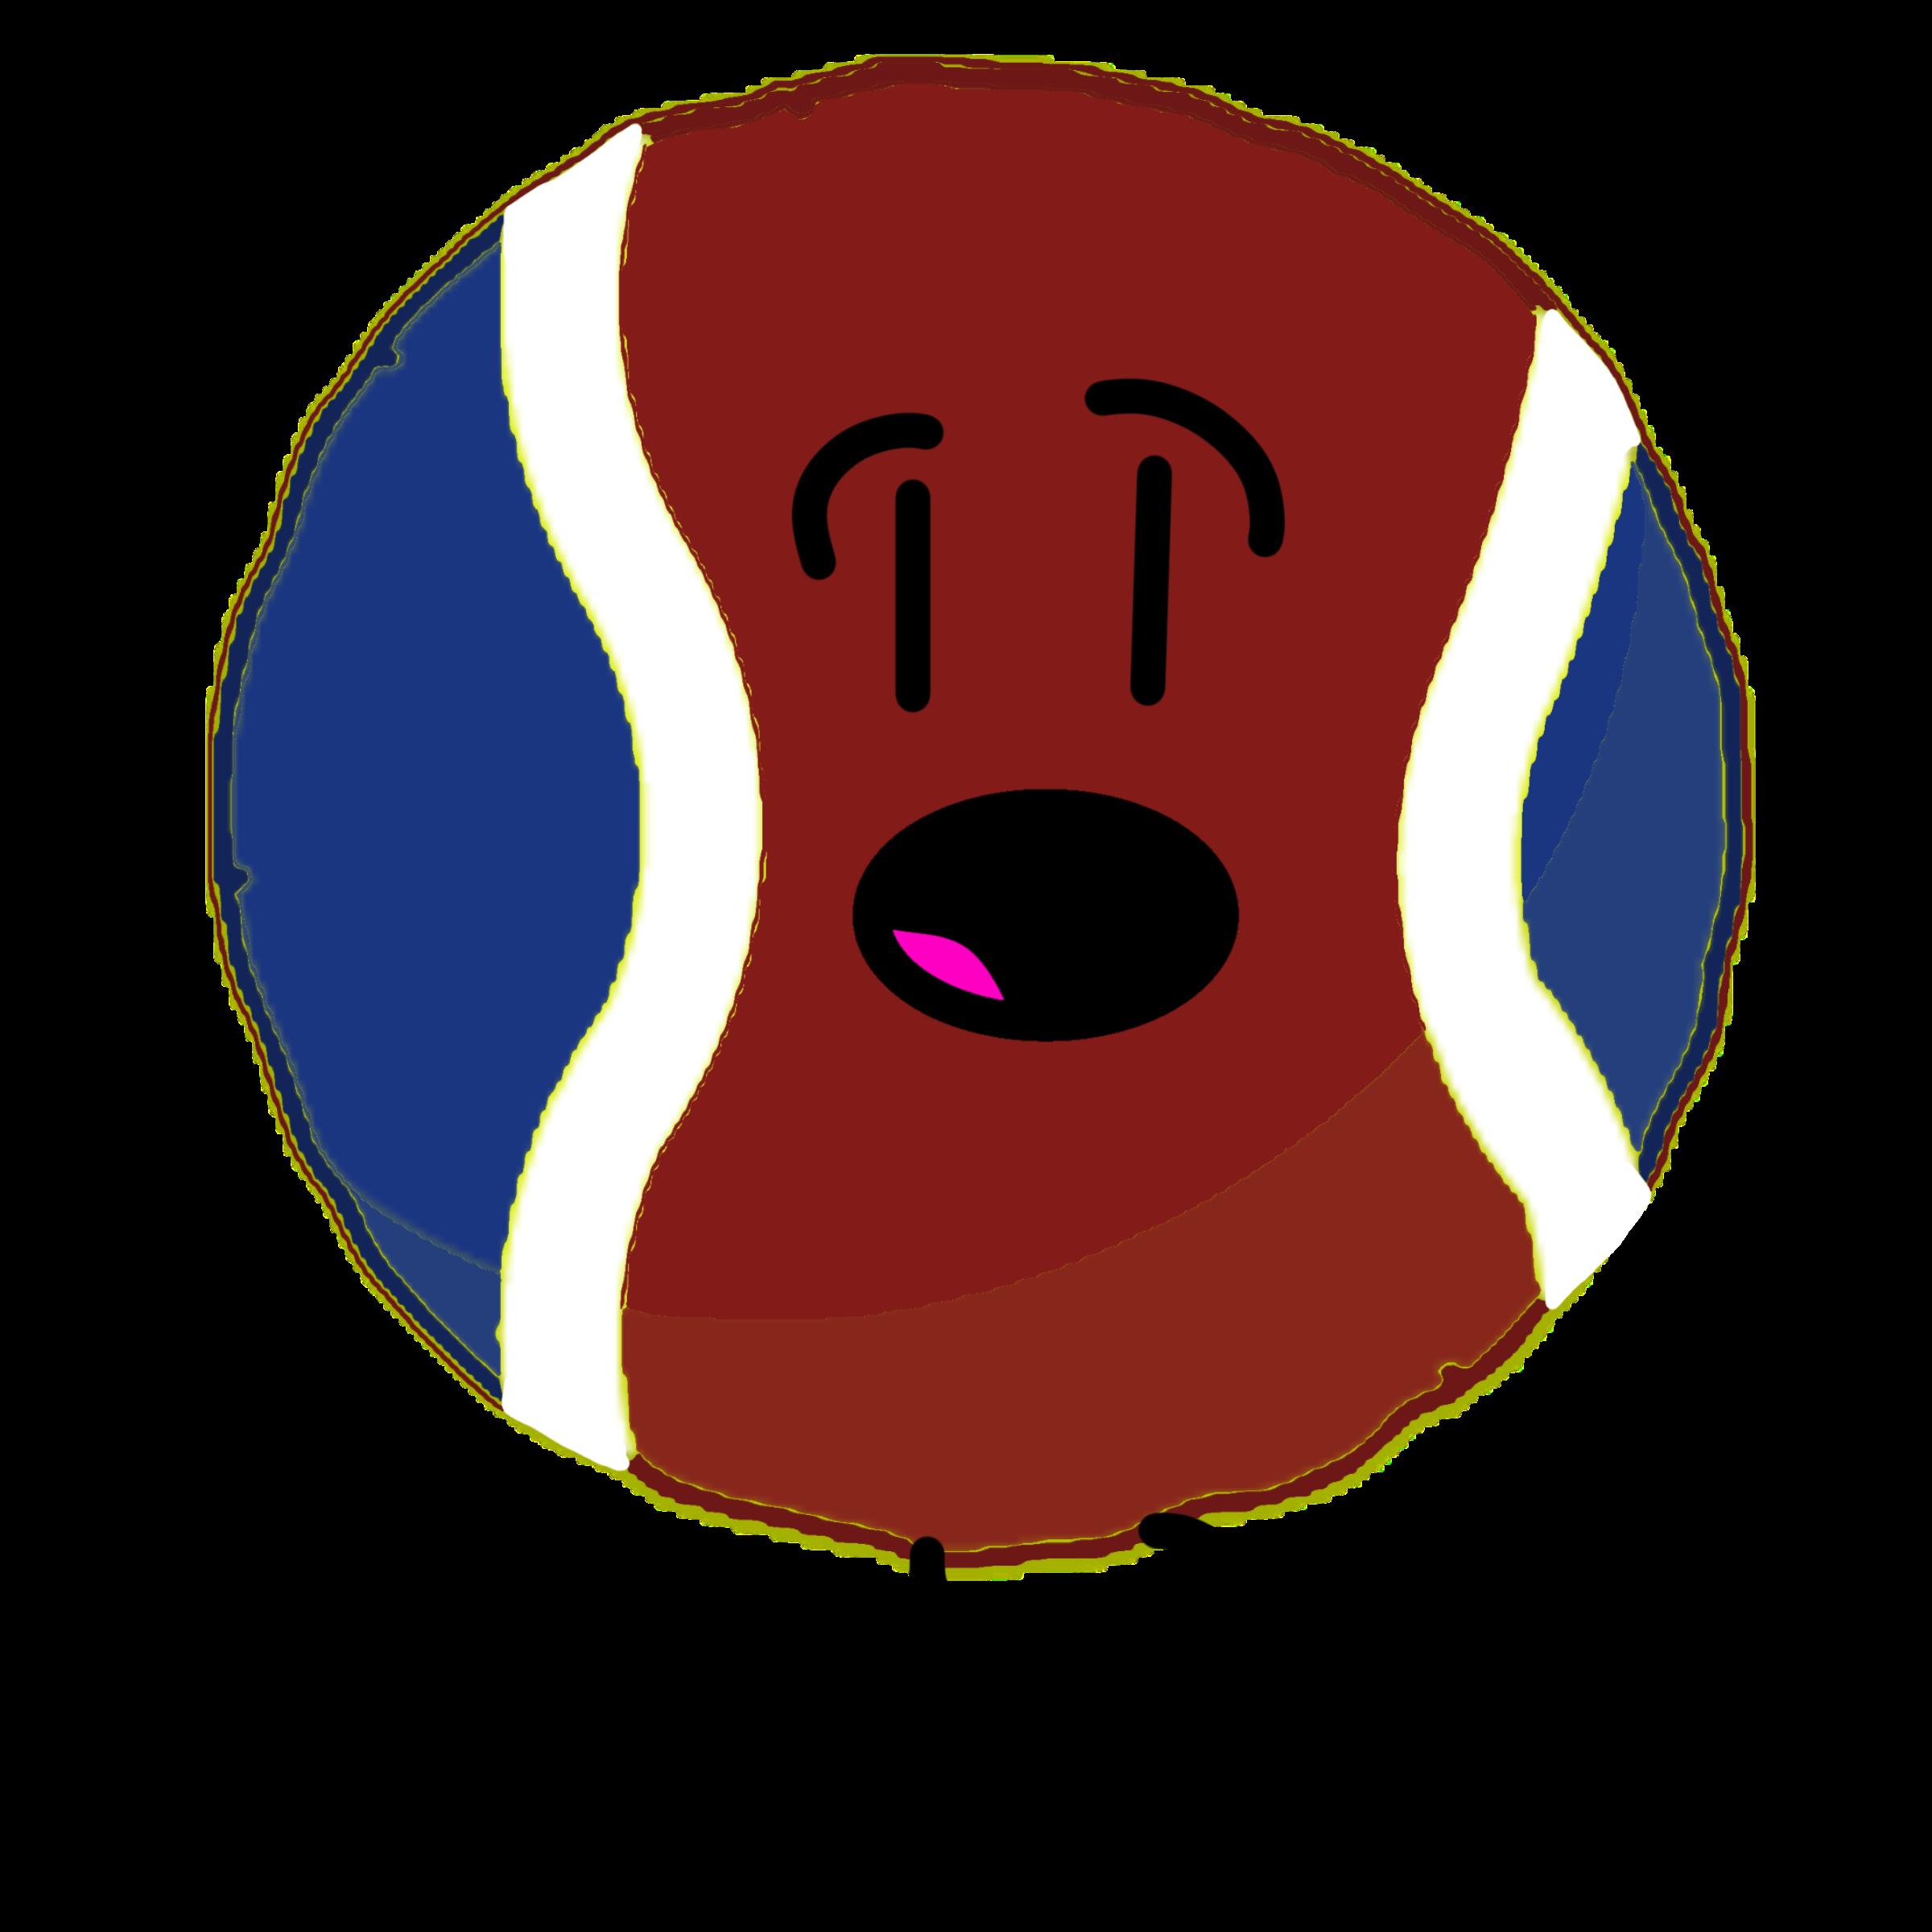 American Tennis Ball